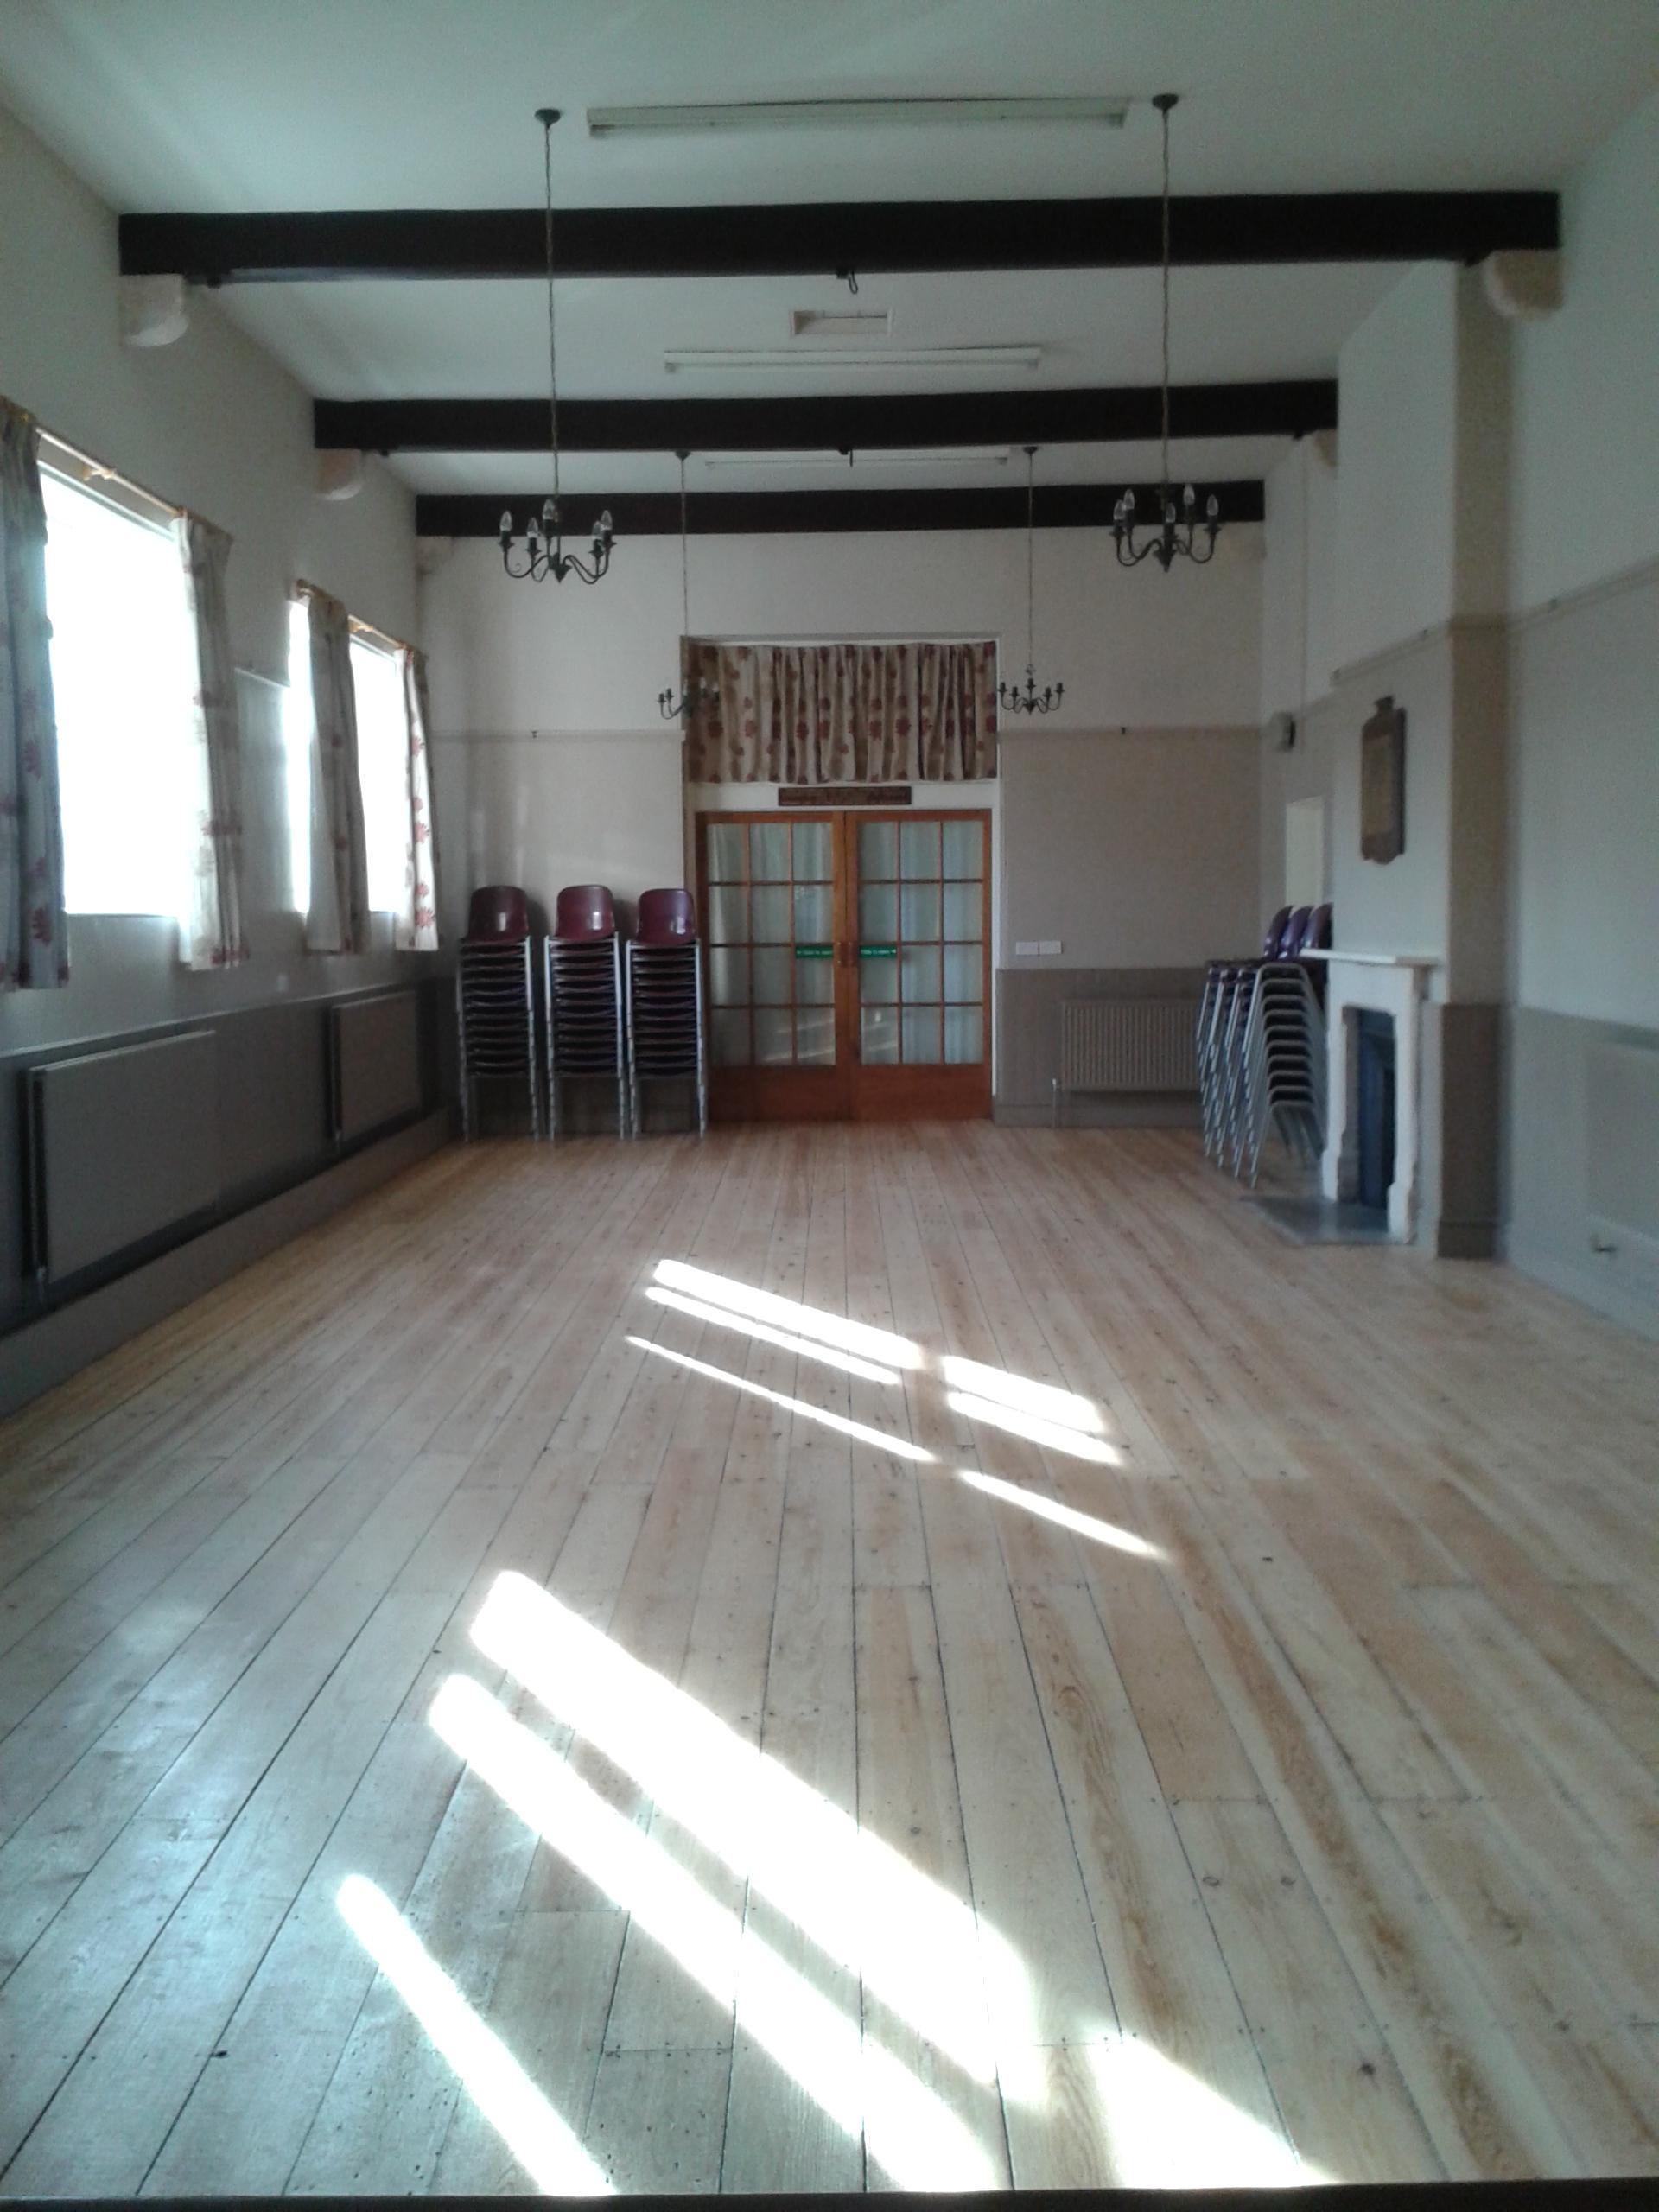 Foxham Reading Room & Village Hall